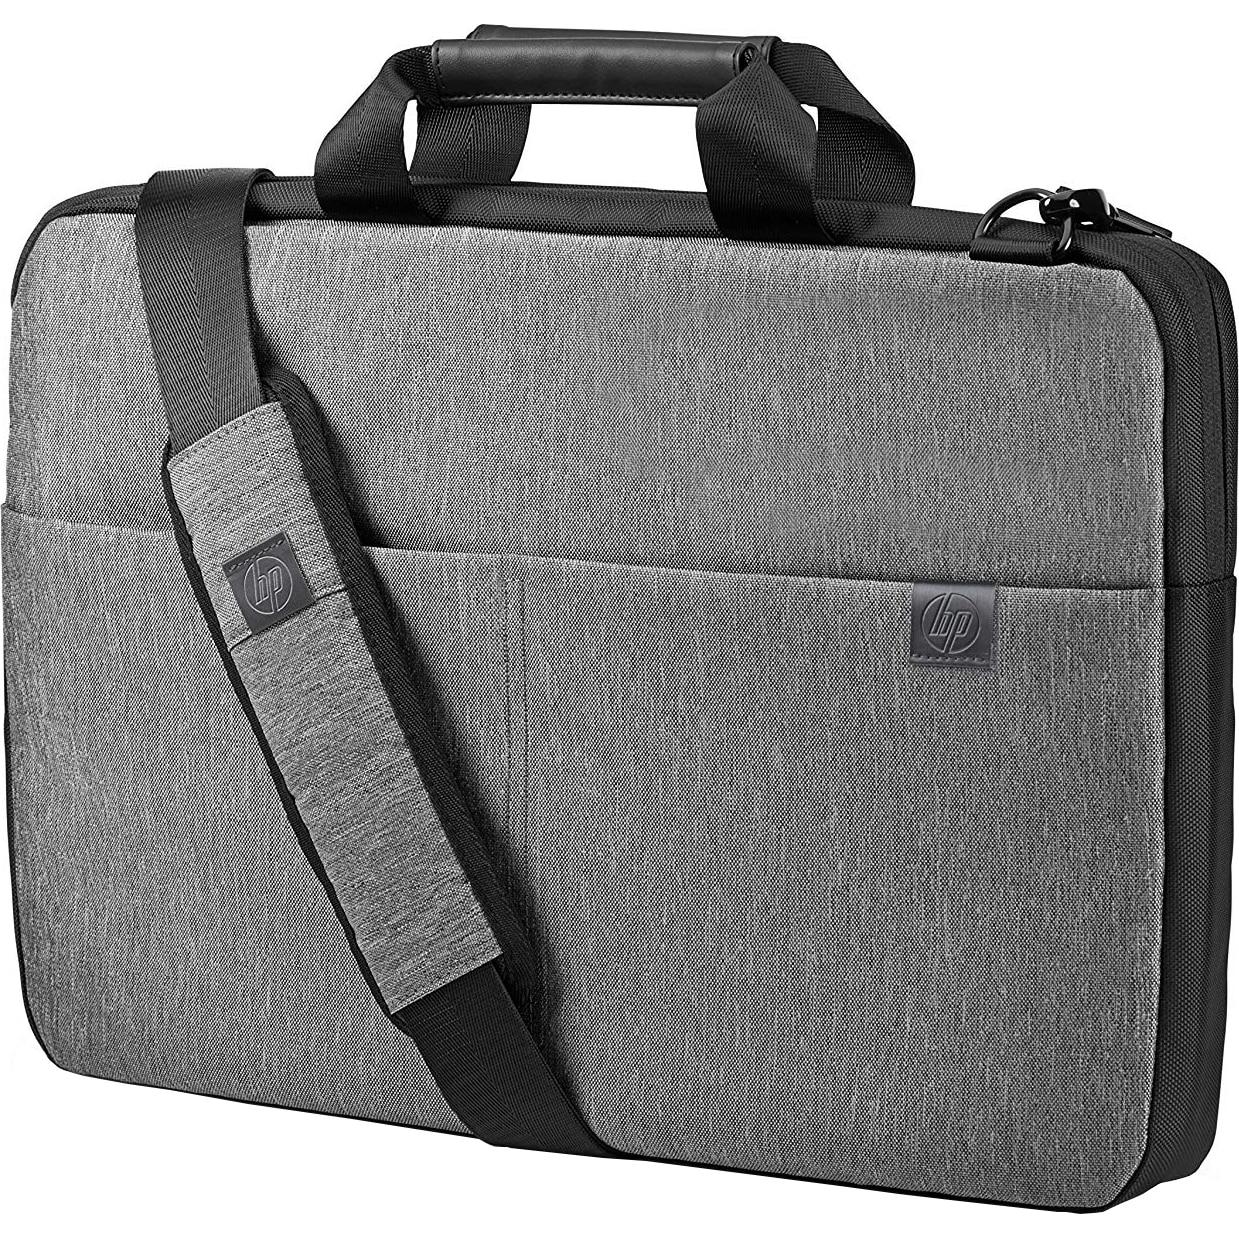 "Fotografie Geanta Laptop HP Signature Slim Topload, 15.6"", Gri/Negru"